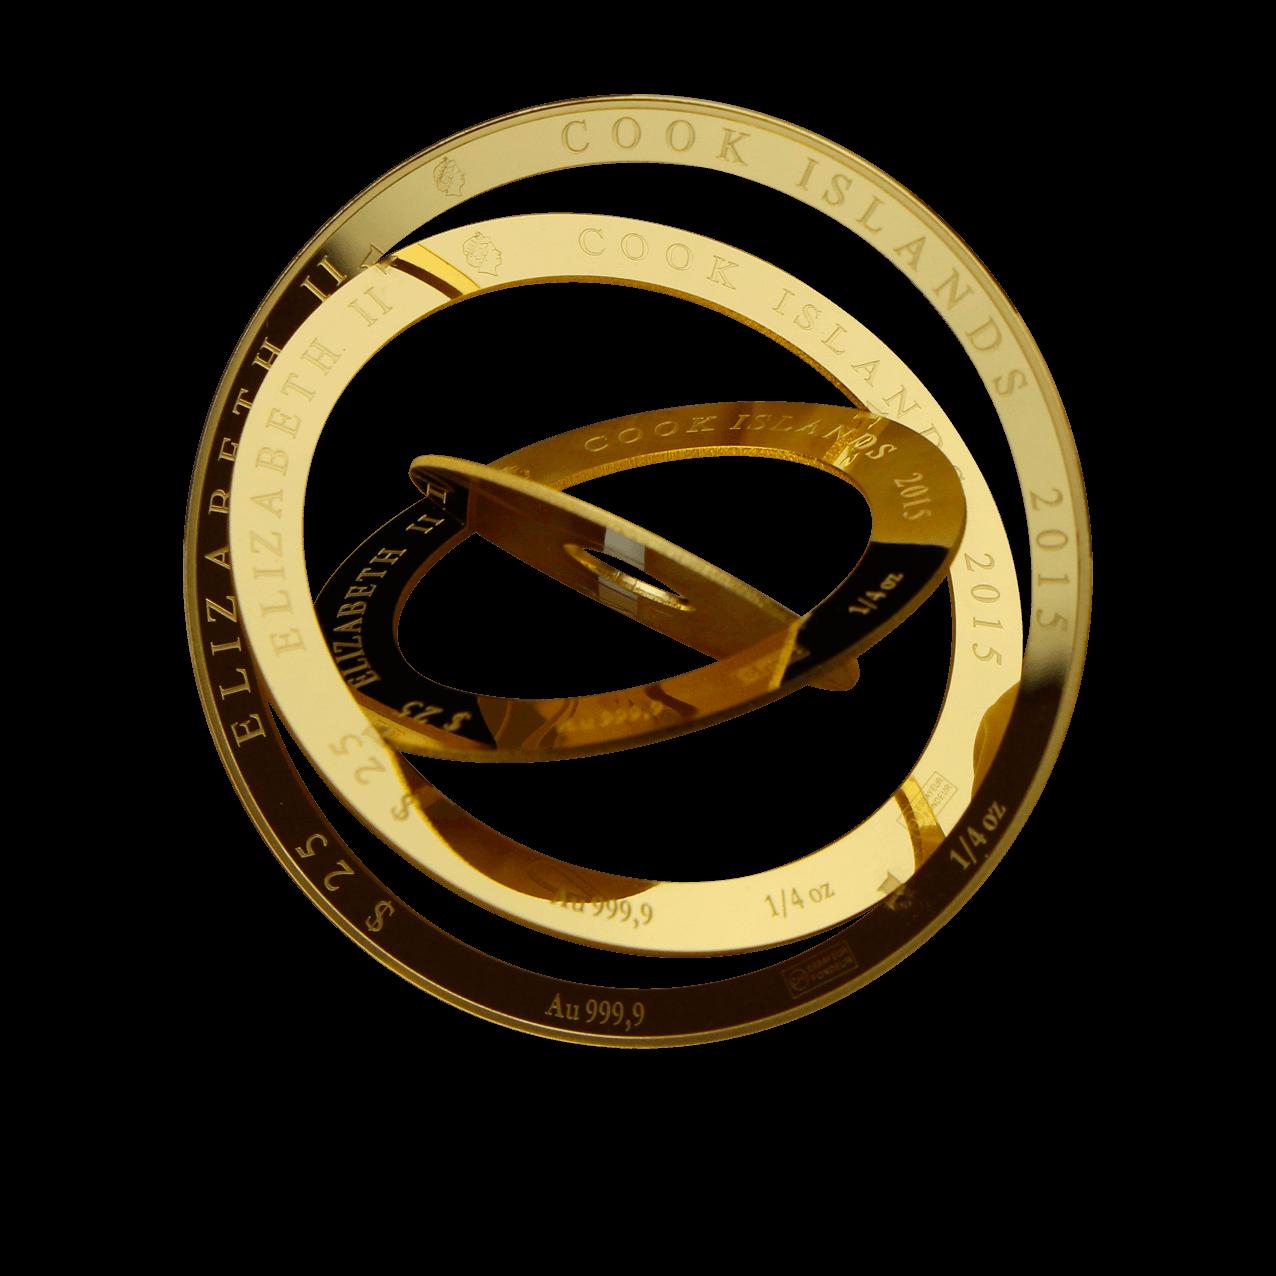 moneda con aro militar de cook